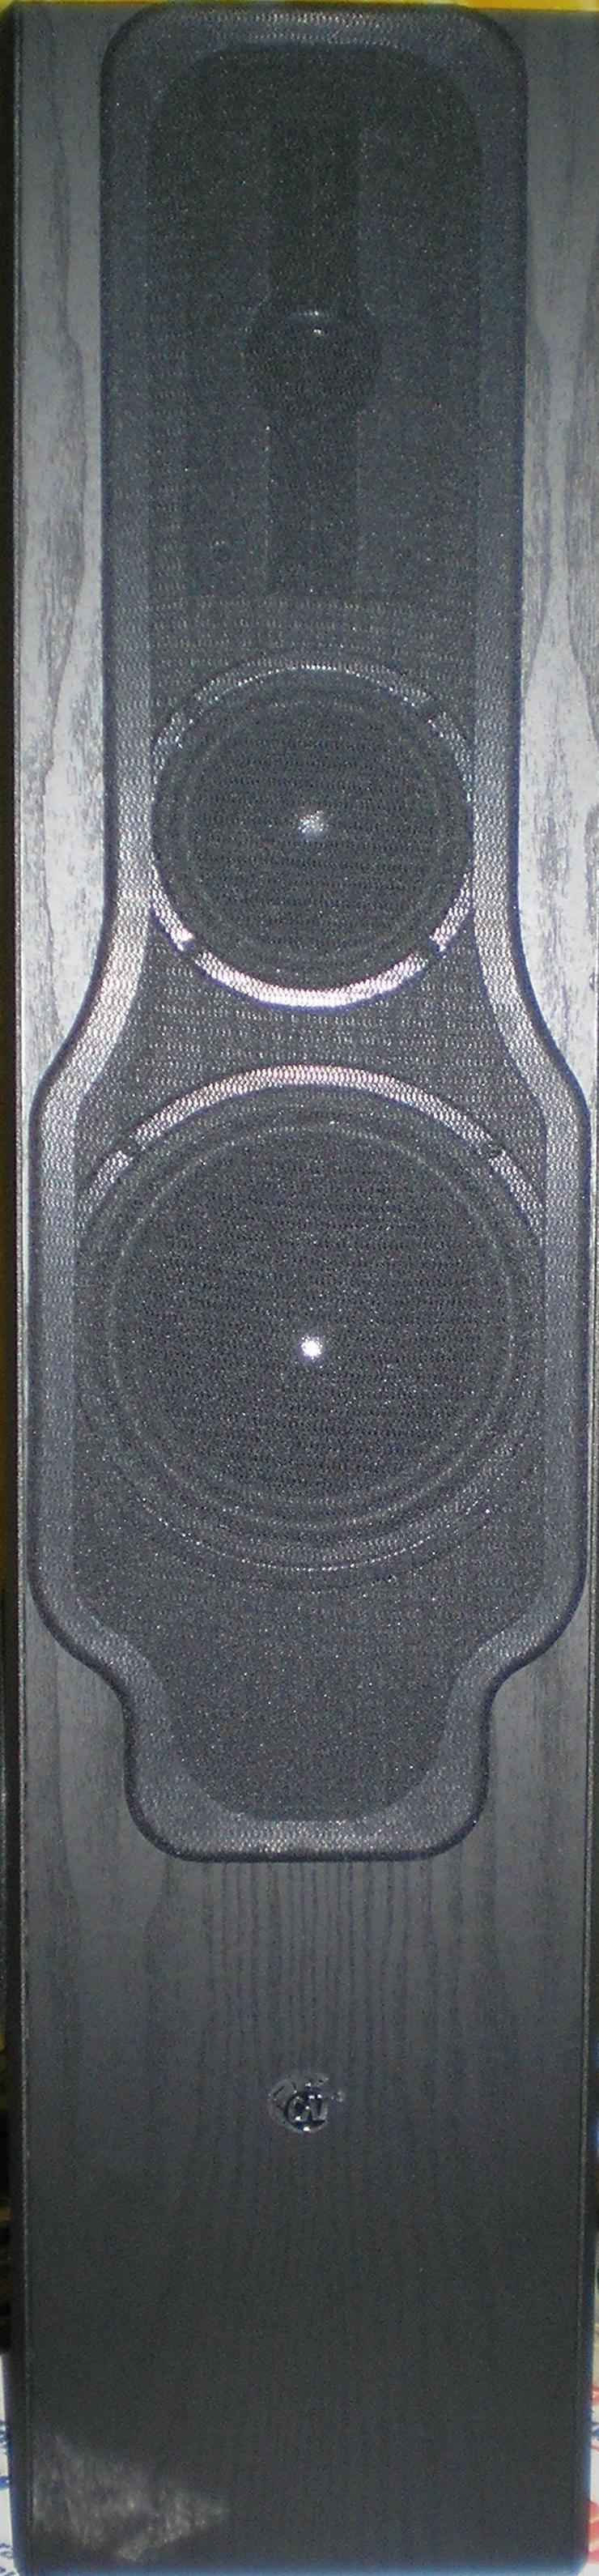 440 Watt Standboxen,Rear + Centerspeaker,JBL-Subwoofer + Satelitten